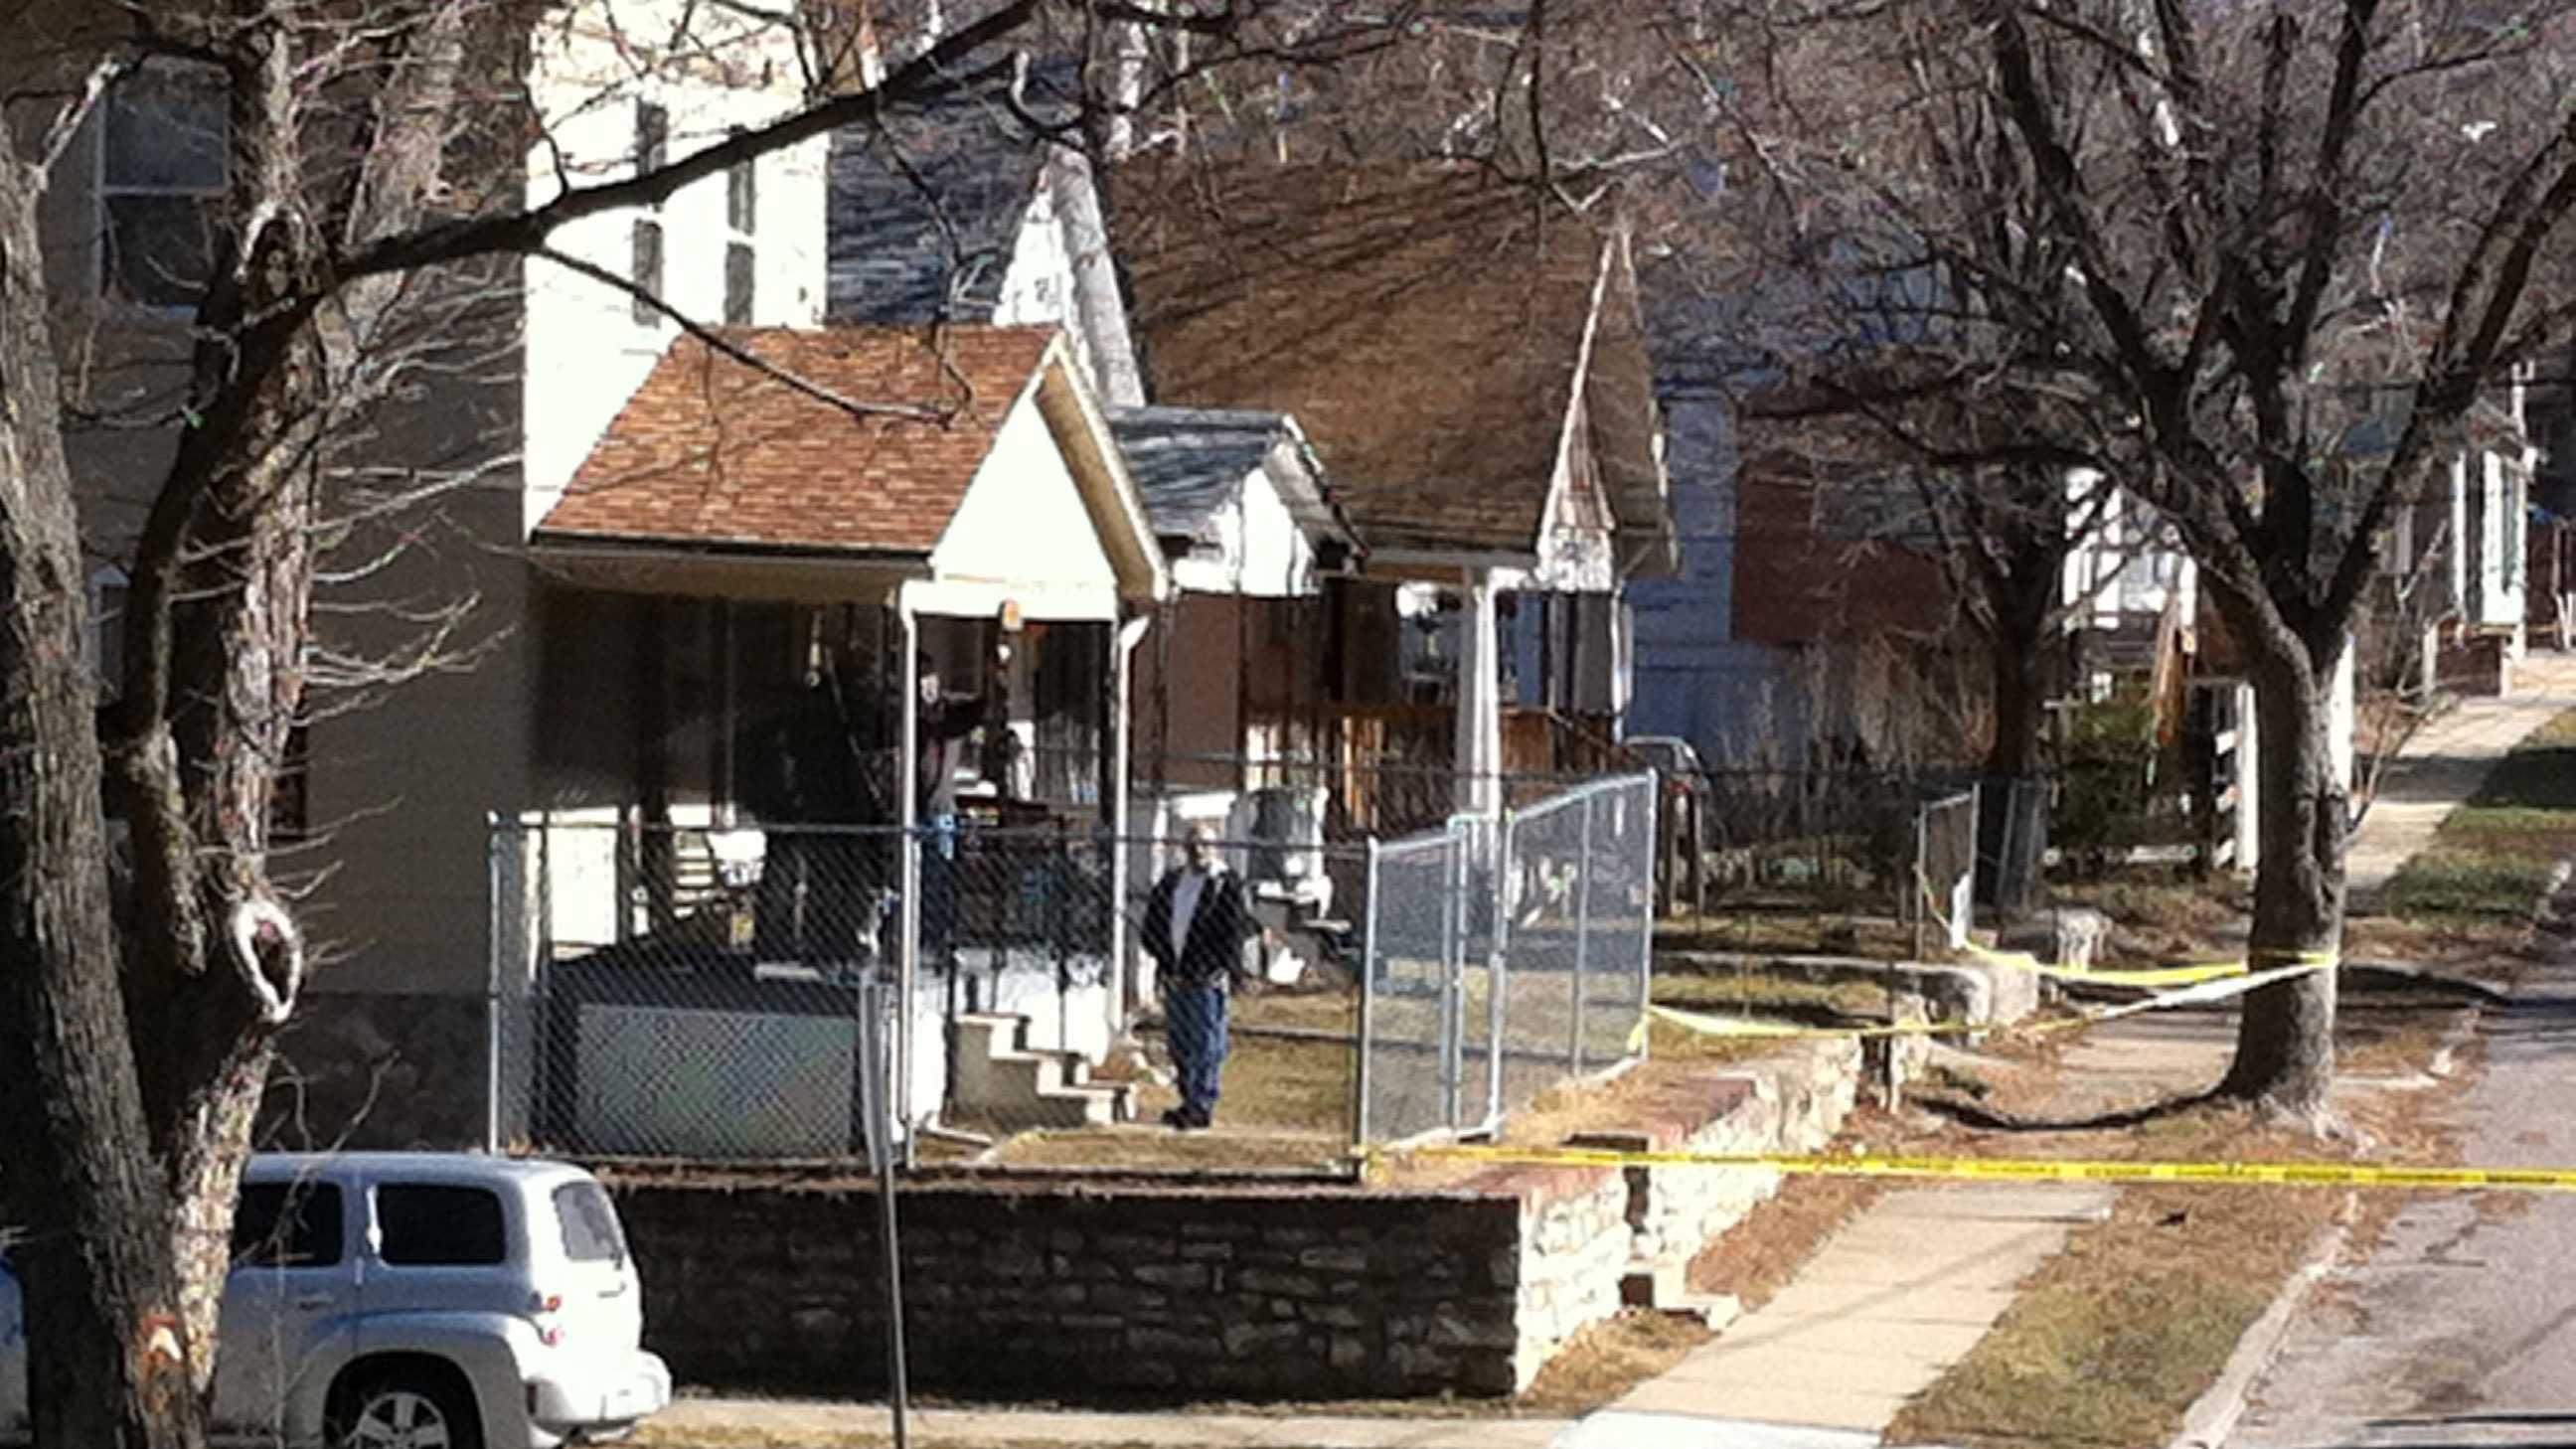 Homicide 4900 East 22nd Street